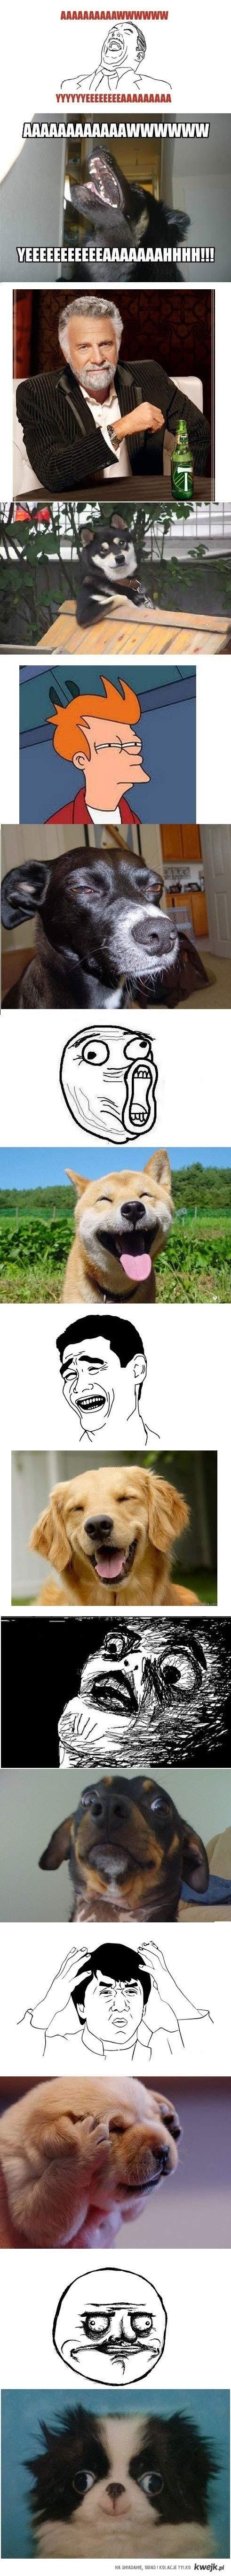 psy memów